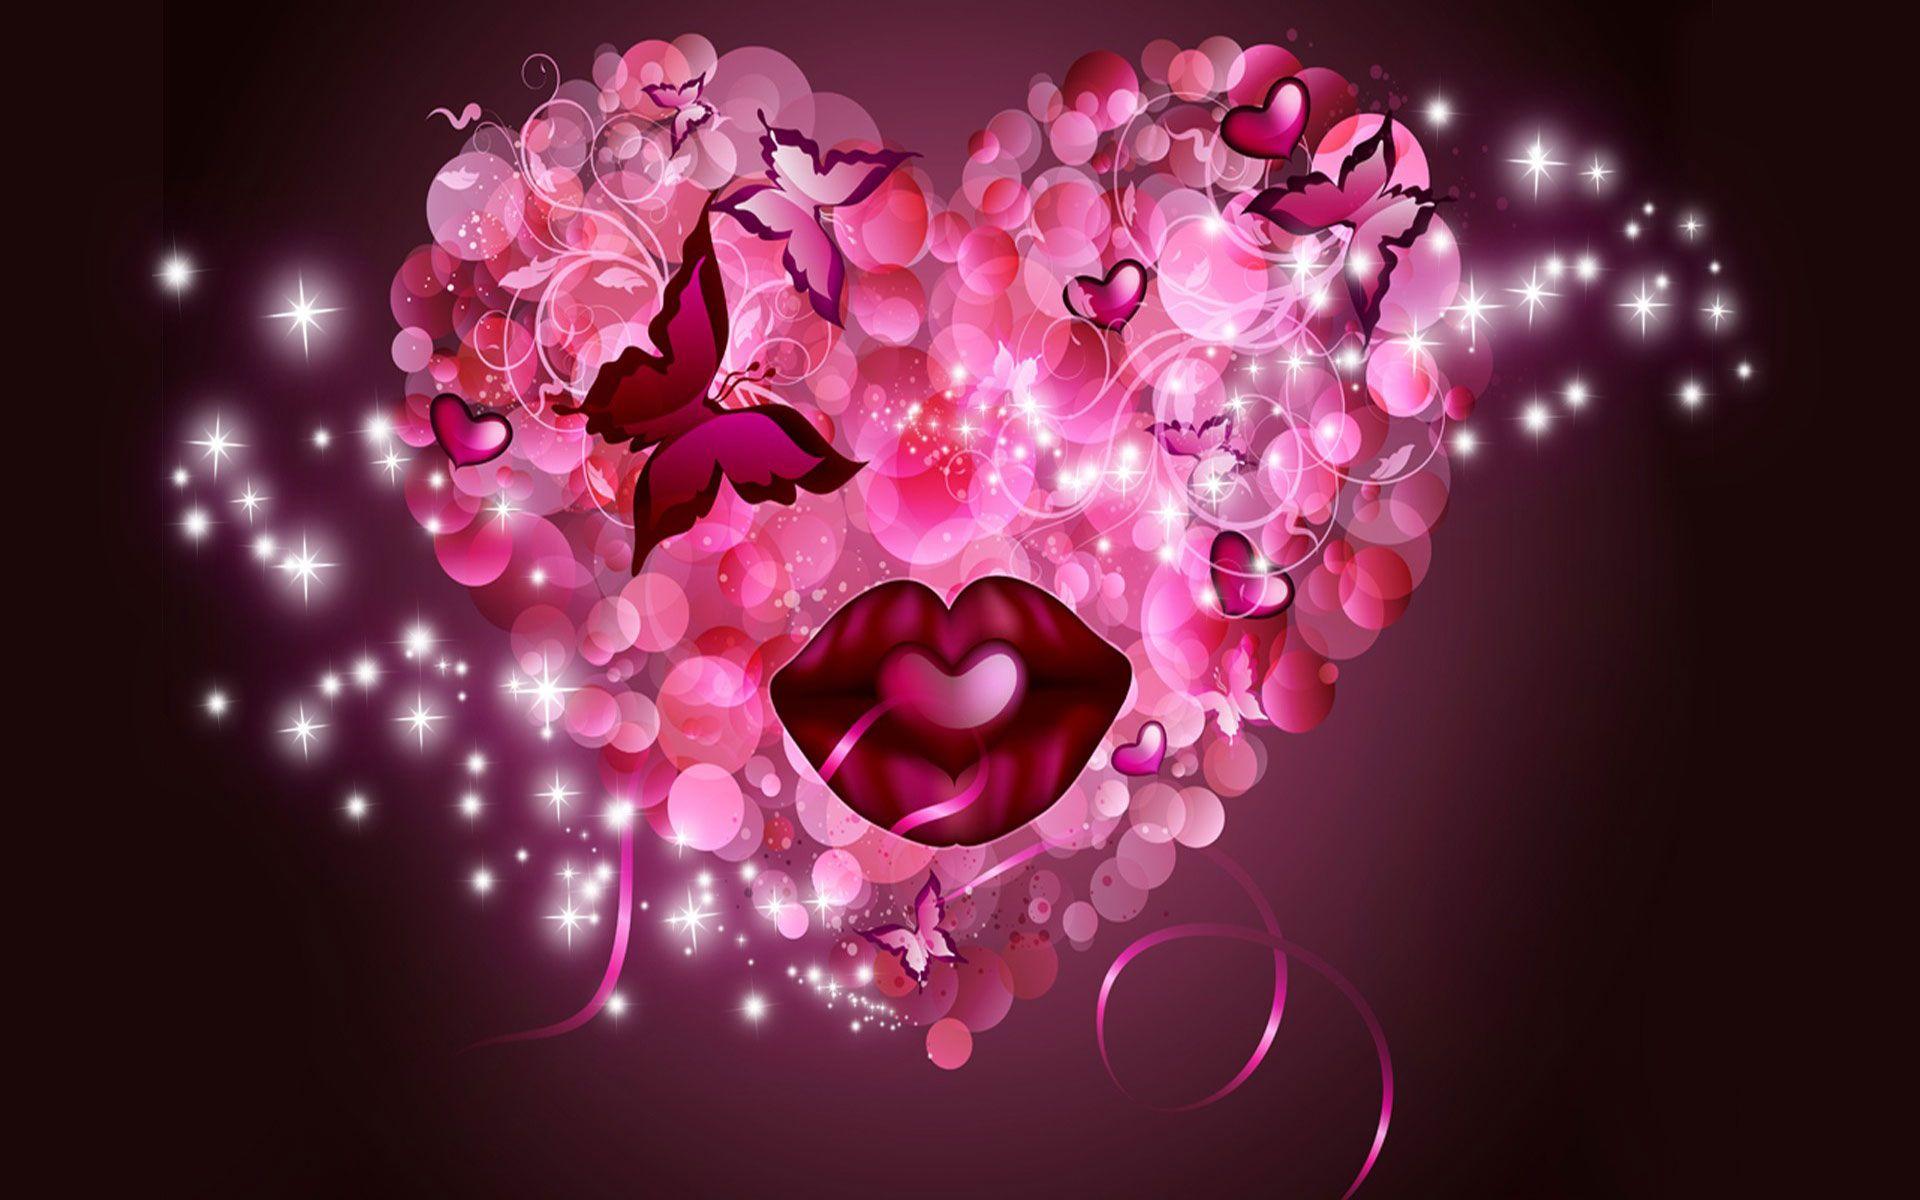 Cute Heart Wallpapers Hd Free Heart Shaped Love Images Heart Wallpaper Heart Wallpaper Hd Love Wallpaper